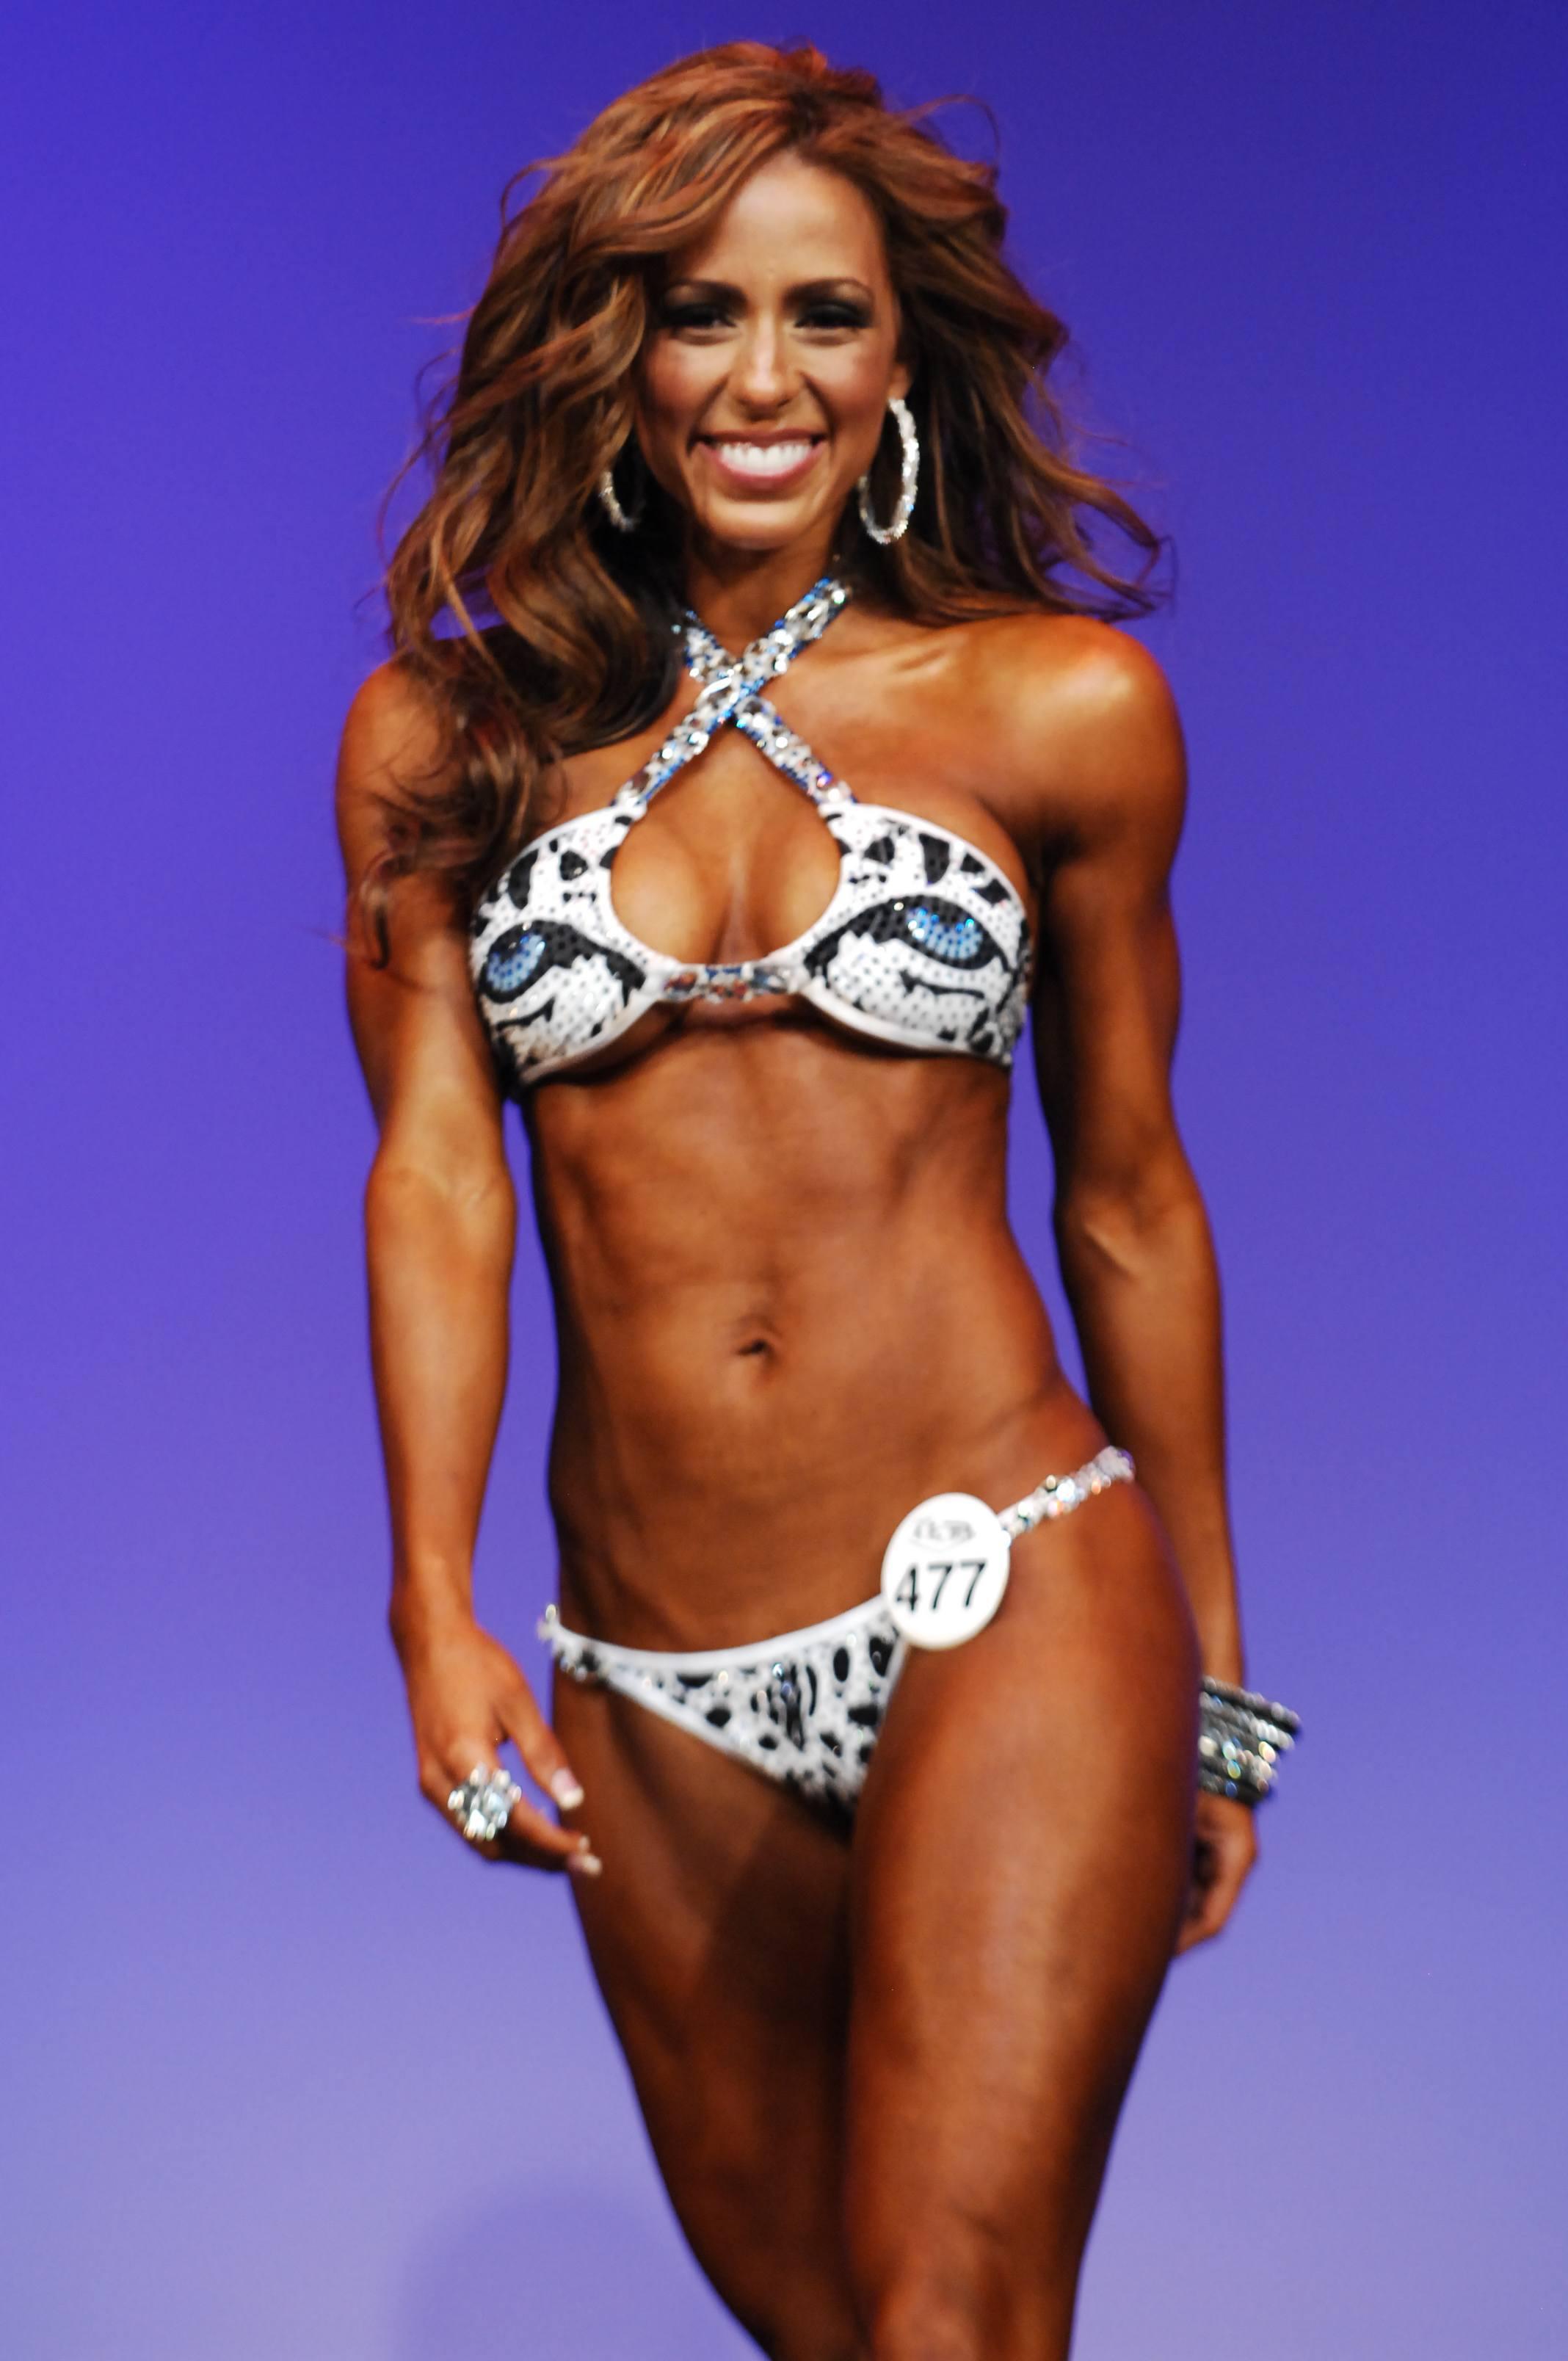 WBFF Diva Bikini Model Pro World Champion Chady Dunmore